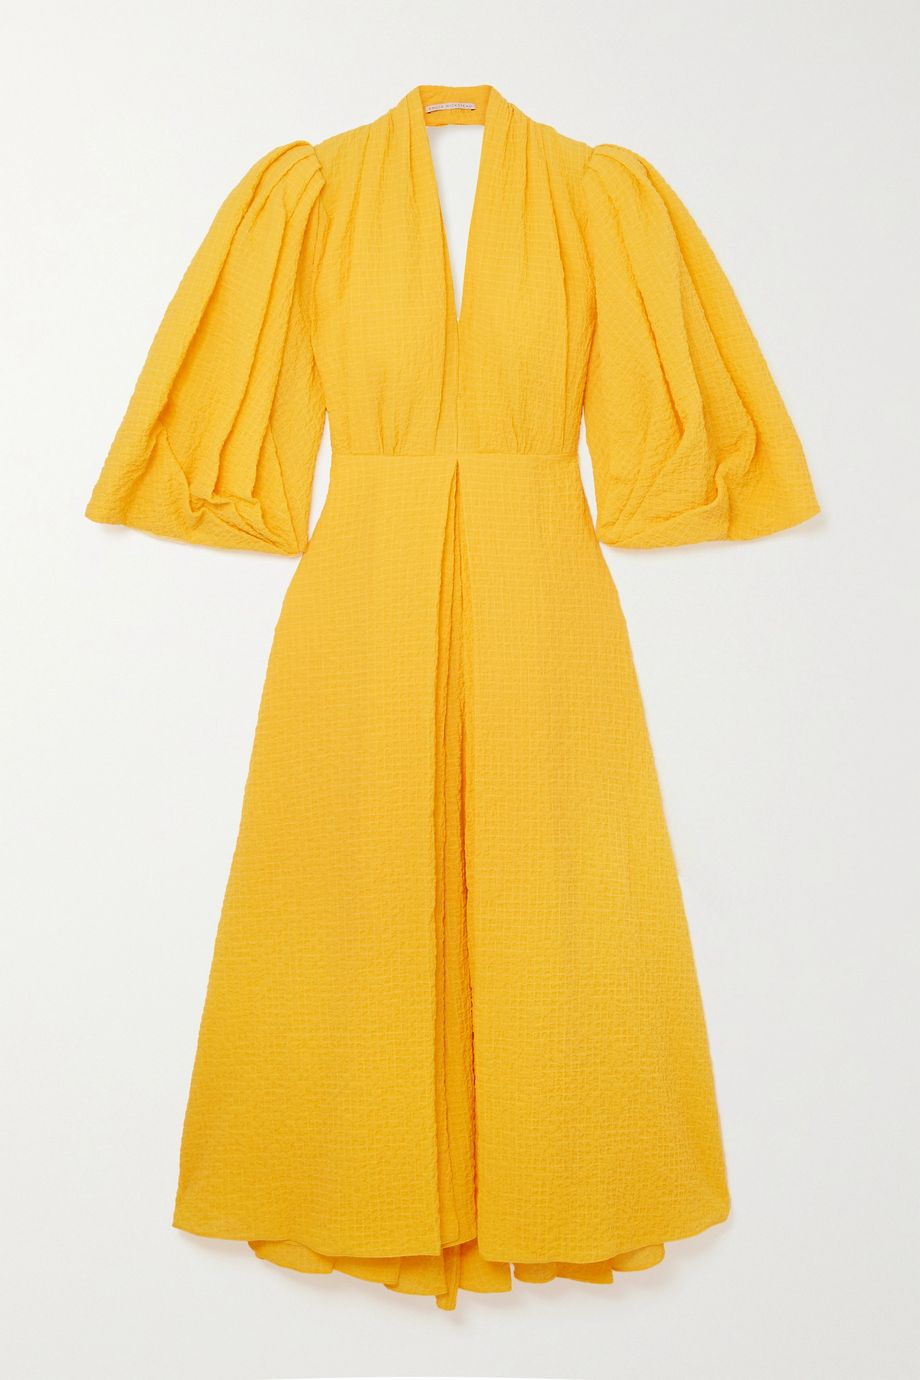 Emilia Wickstead Deva open-back gathered cotton-blend cloqué midi dress